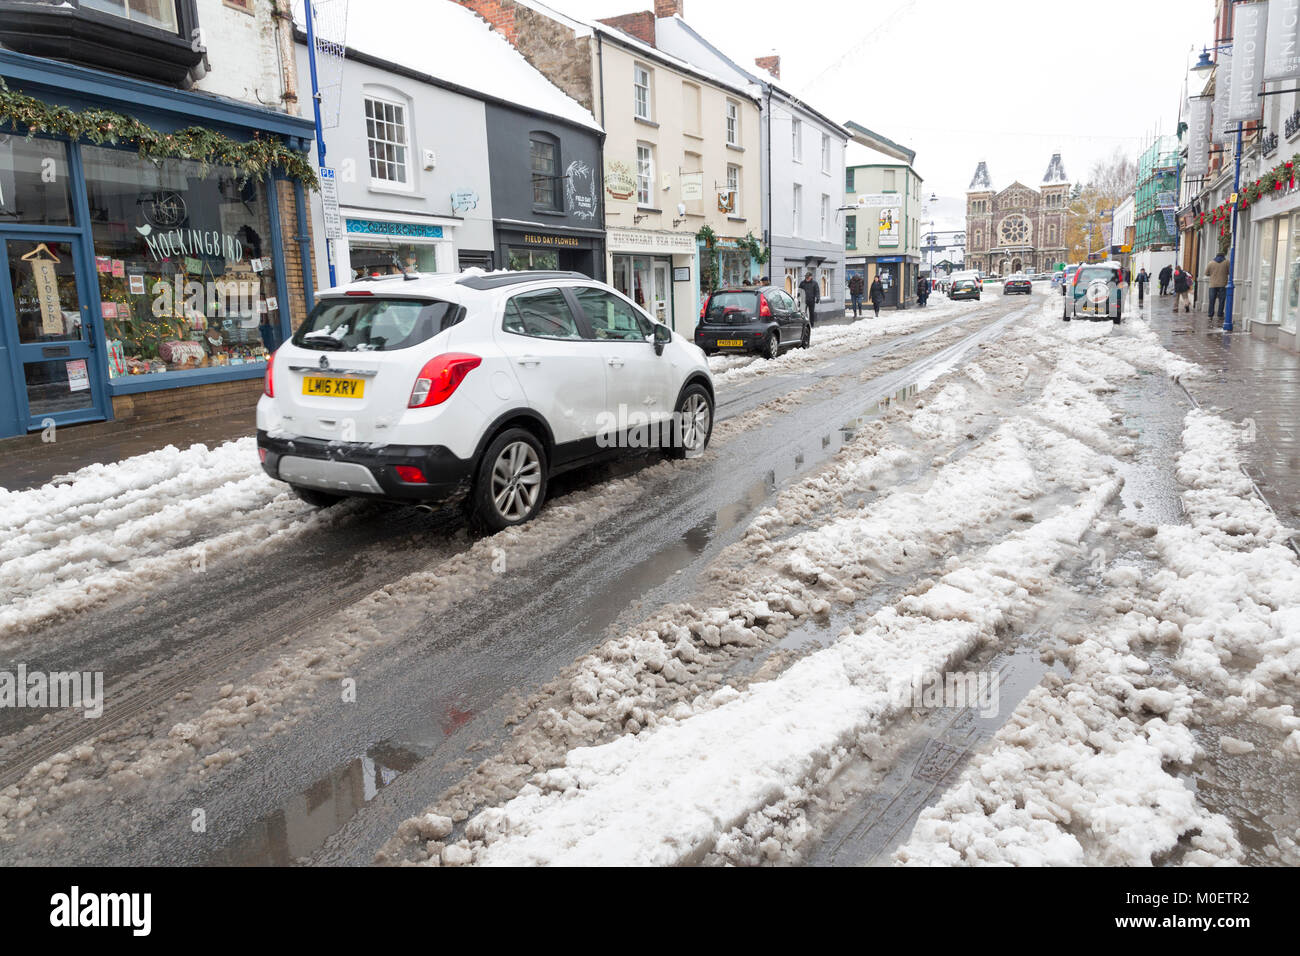 Cars driving through slush in street, Abergavenny, Wales, UK - Stock Image